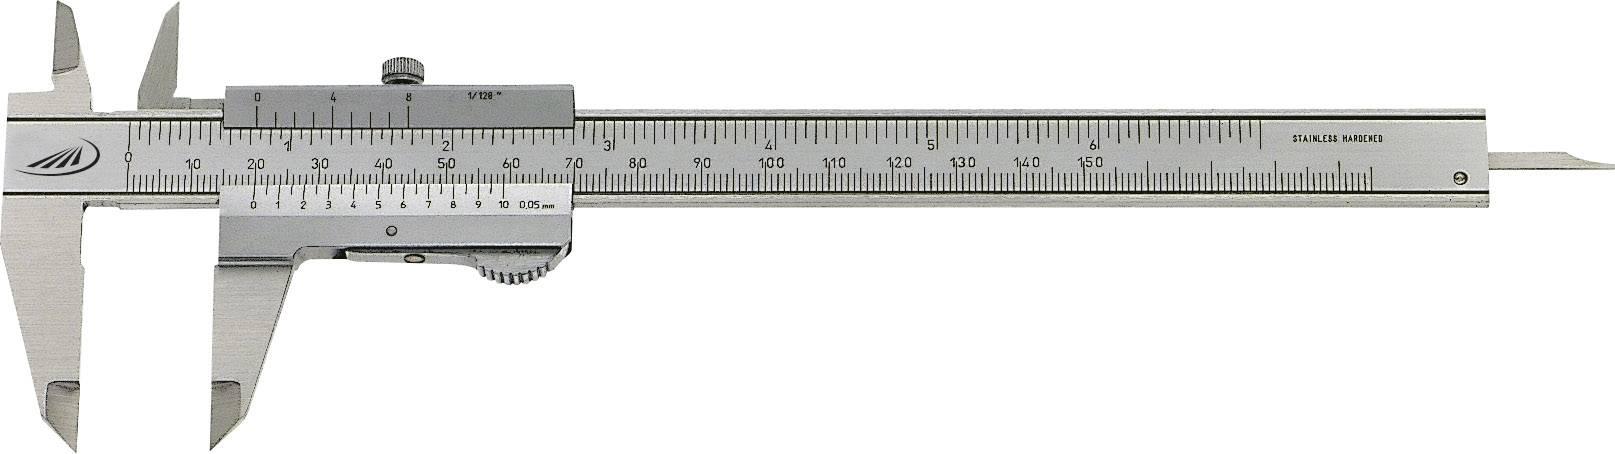 Vreckové posuvné meradlo Helios Preisser Duo Fix 0190 501, rozsah merania 150 mm